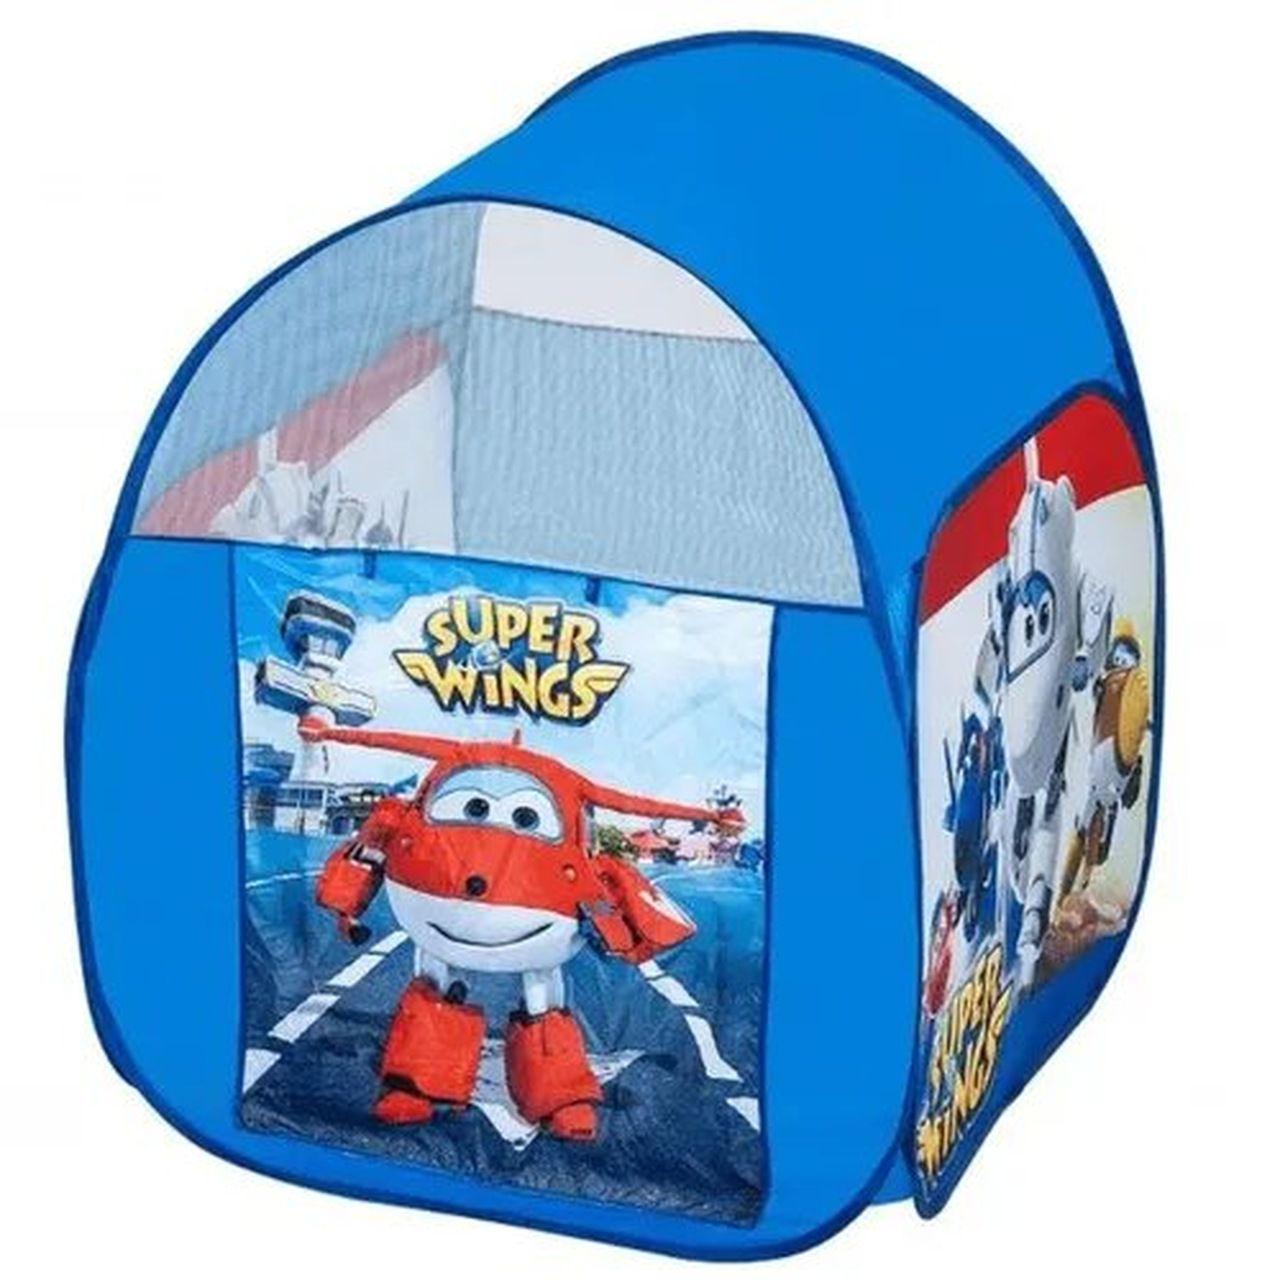 Barraca Infantil Super Wings - Fun 8435